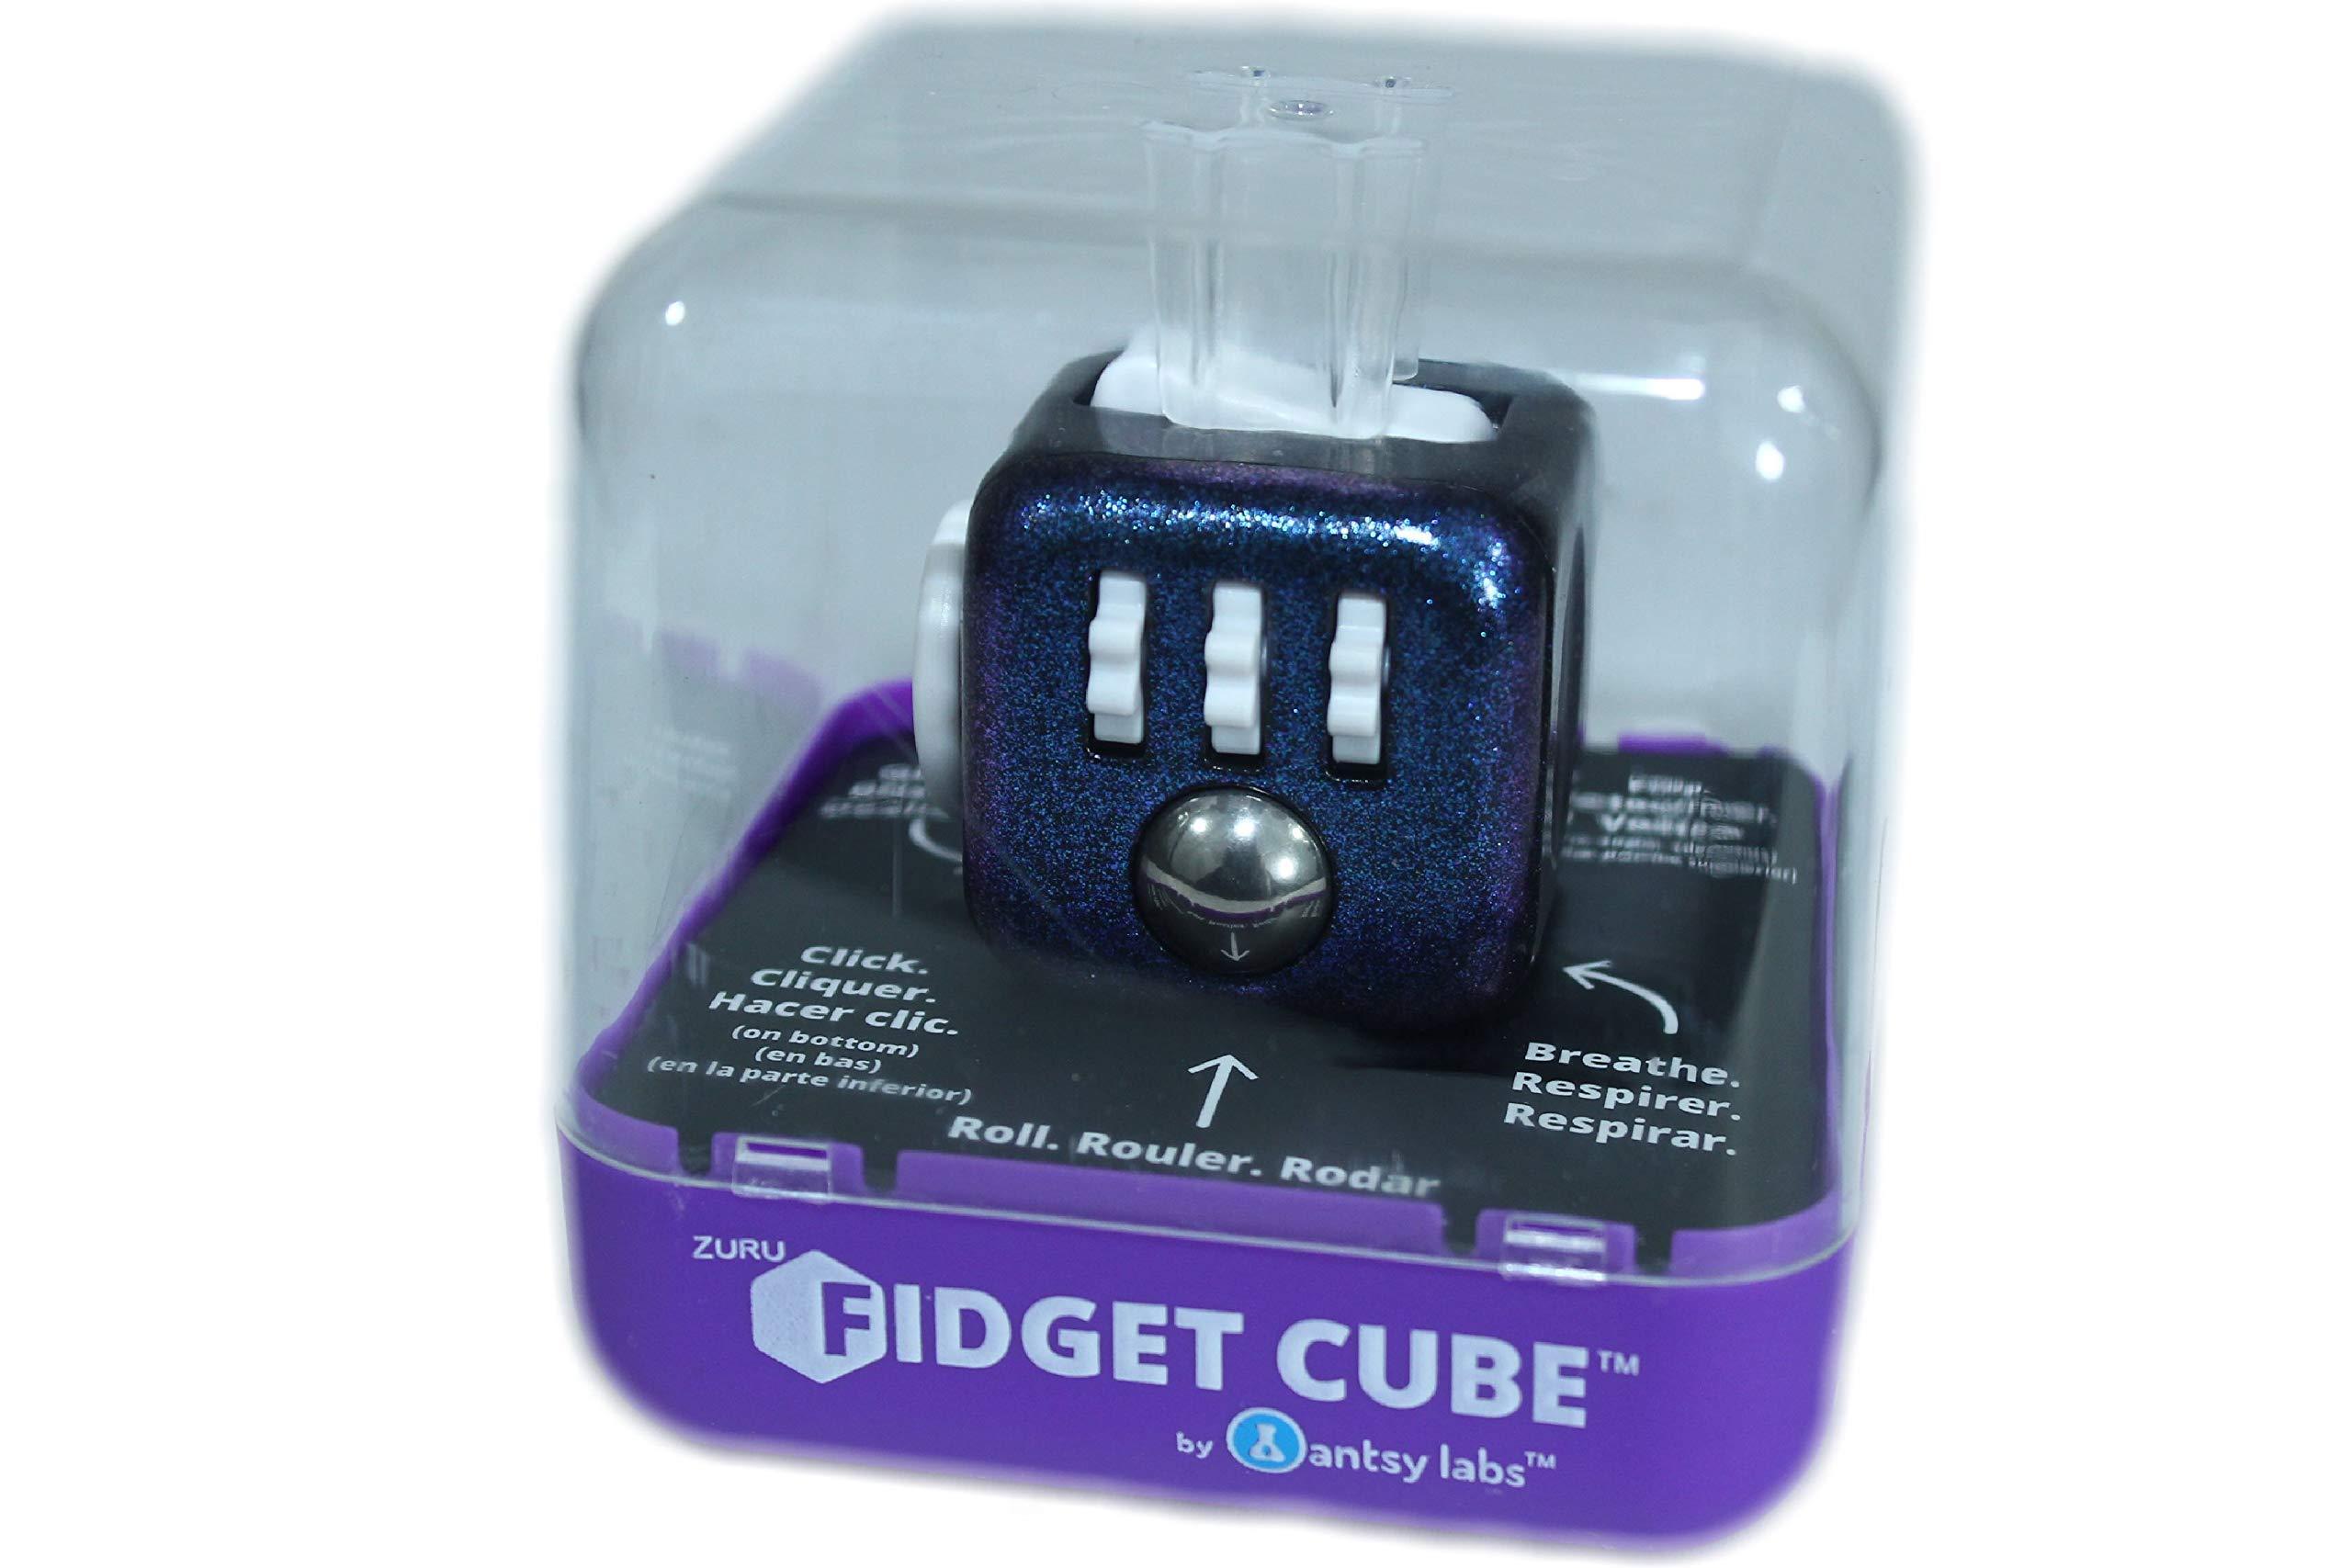 Zuru Fidget Cube by Antsy Labs - Custom Series (Chameleon Paint) Purple Glitter Fidget Cube with White Accents by ZURU